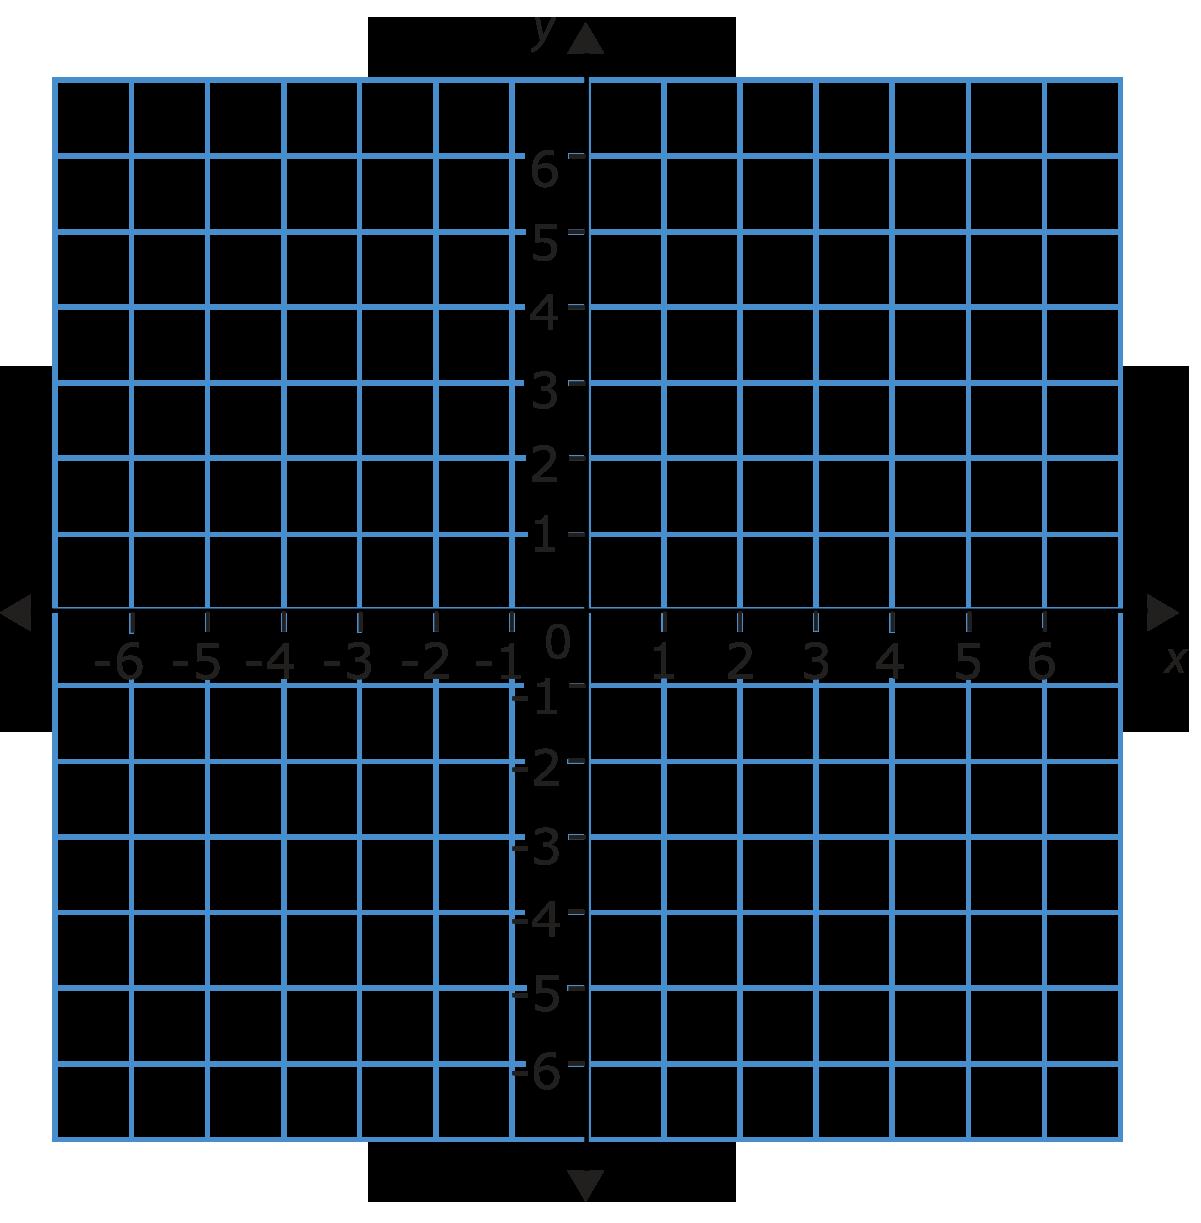 Uncategorized Graphing Coordinates Worksheets uncategorized math quadrants worksheets bidwellranchcam resume site coordinate plot the coordinates sheet 4